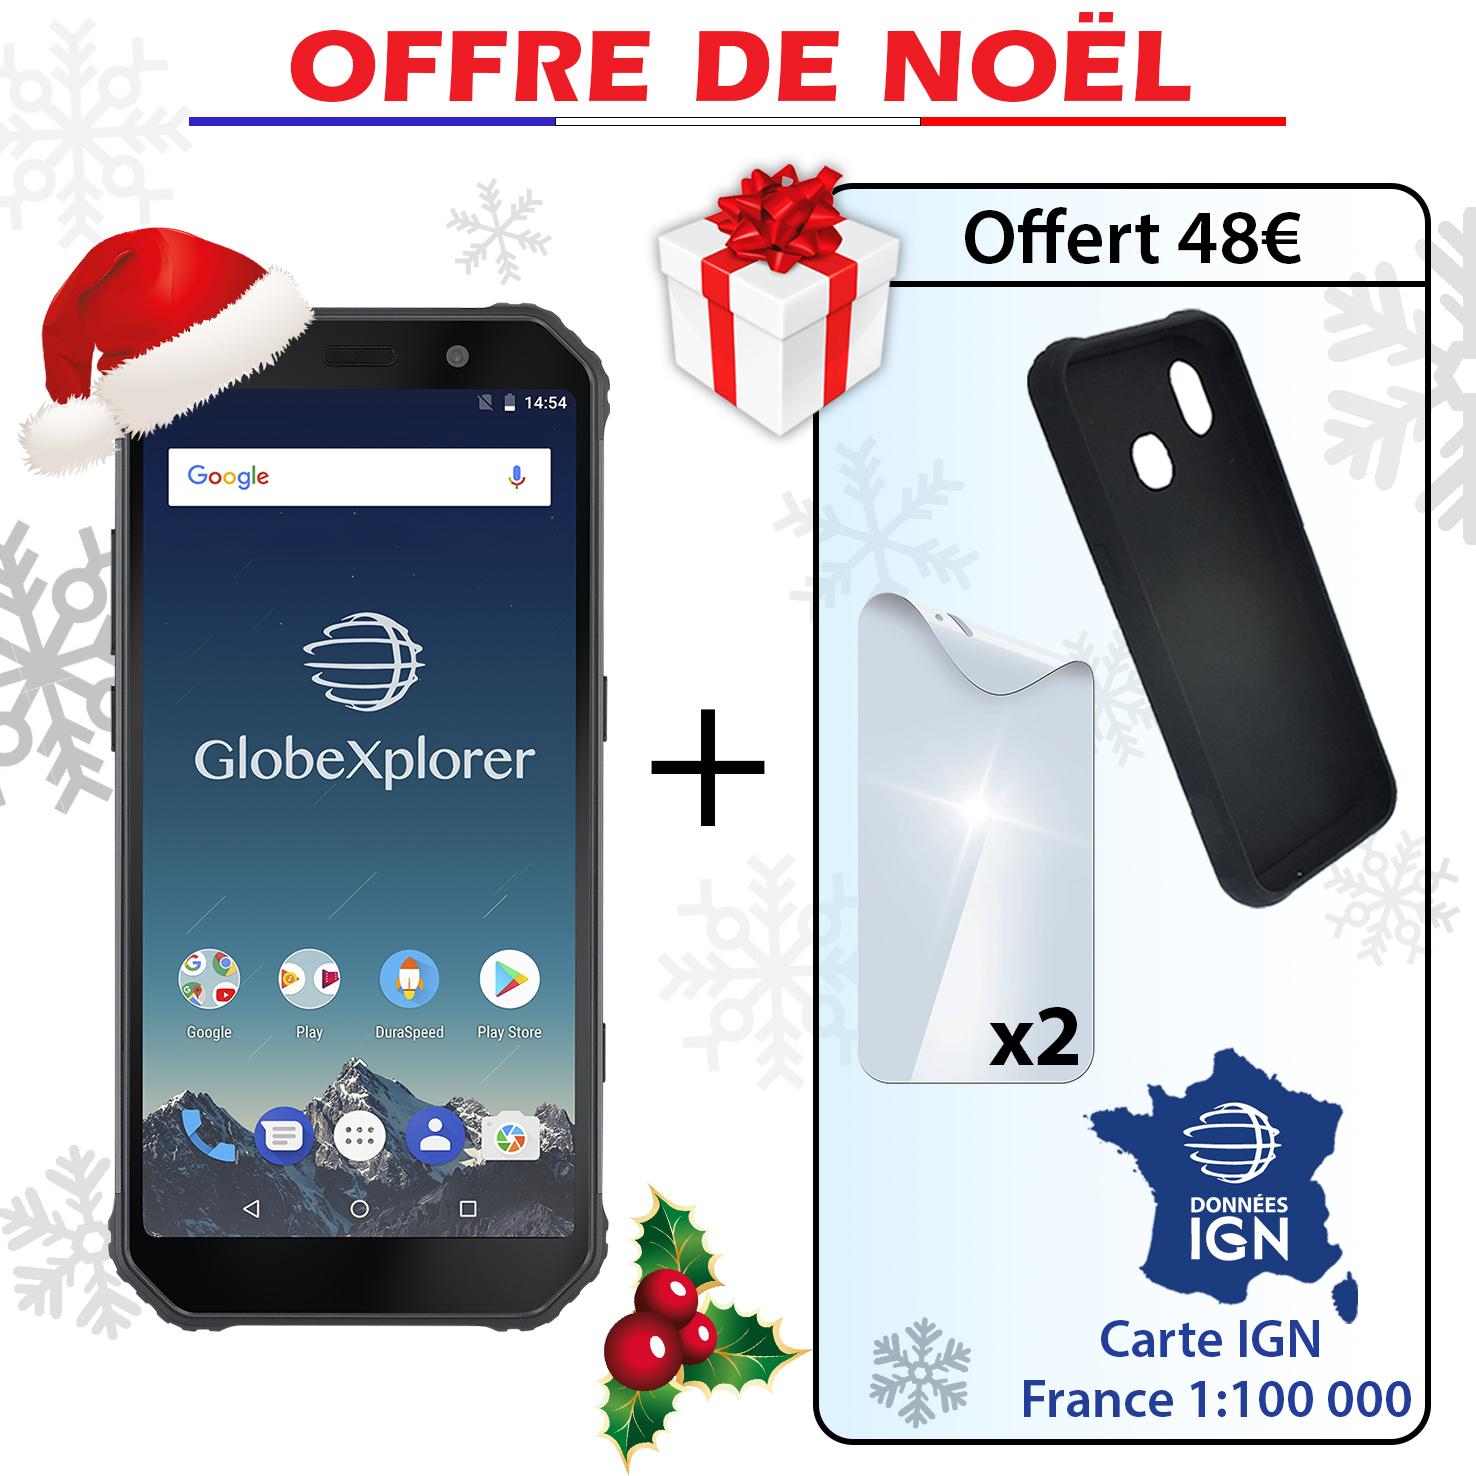 Pack Noël GPX Pro II : Le Voyageur